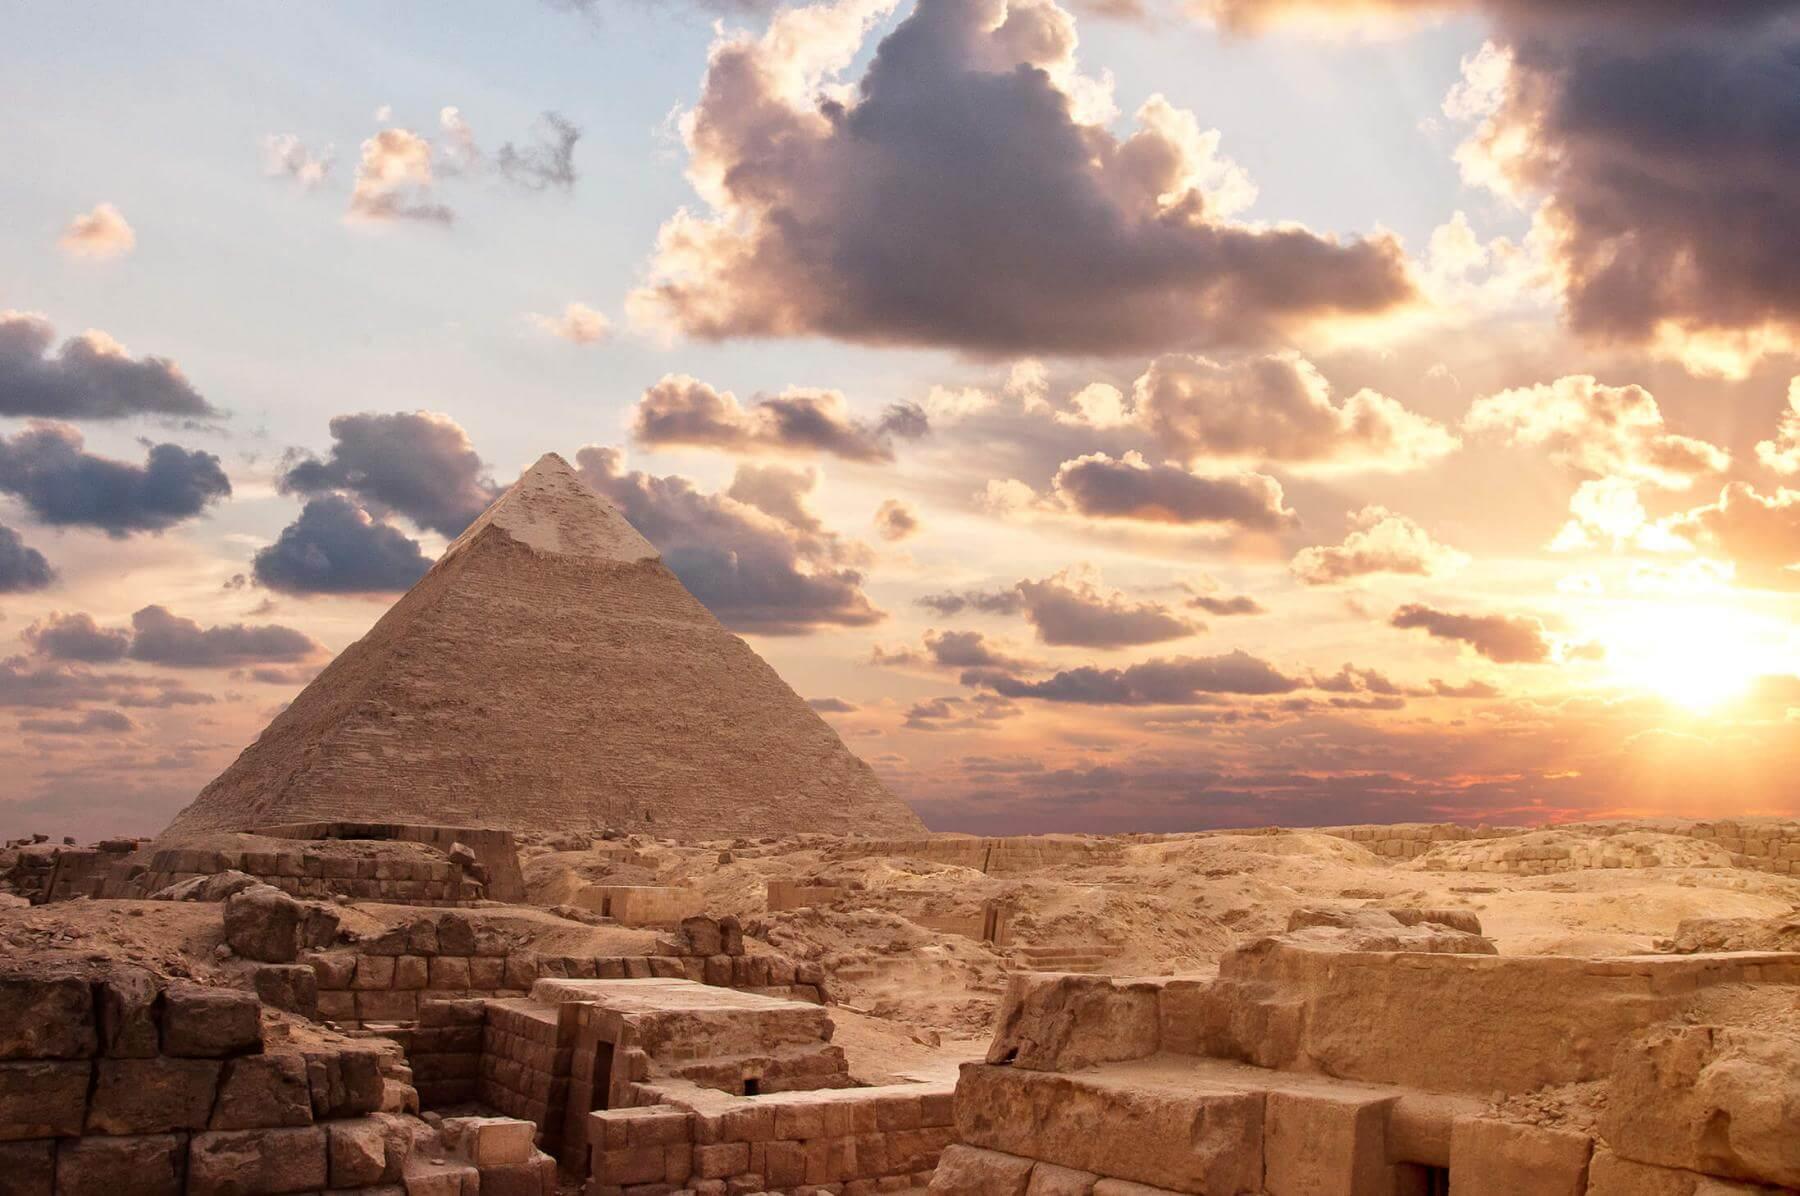 Piramides in Egypt